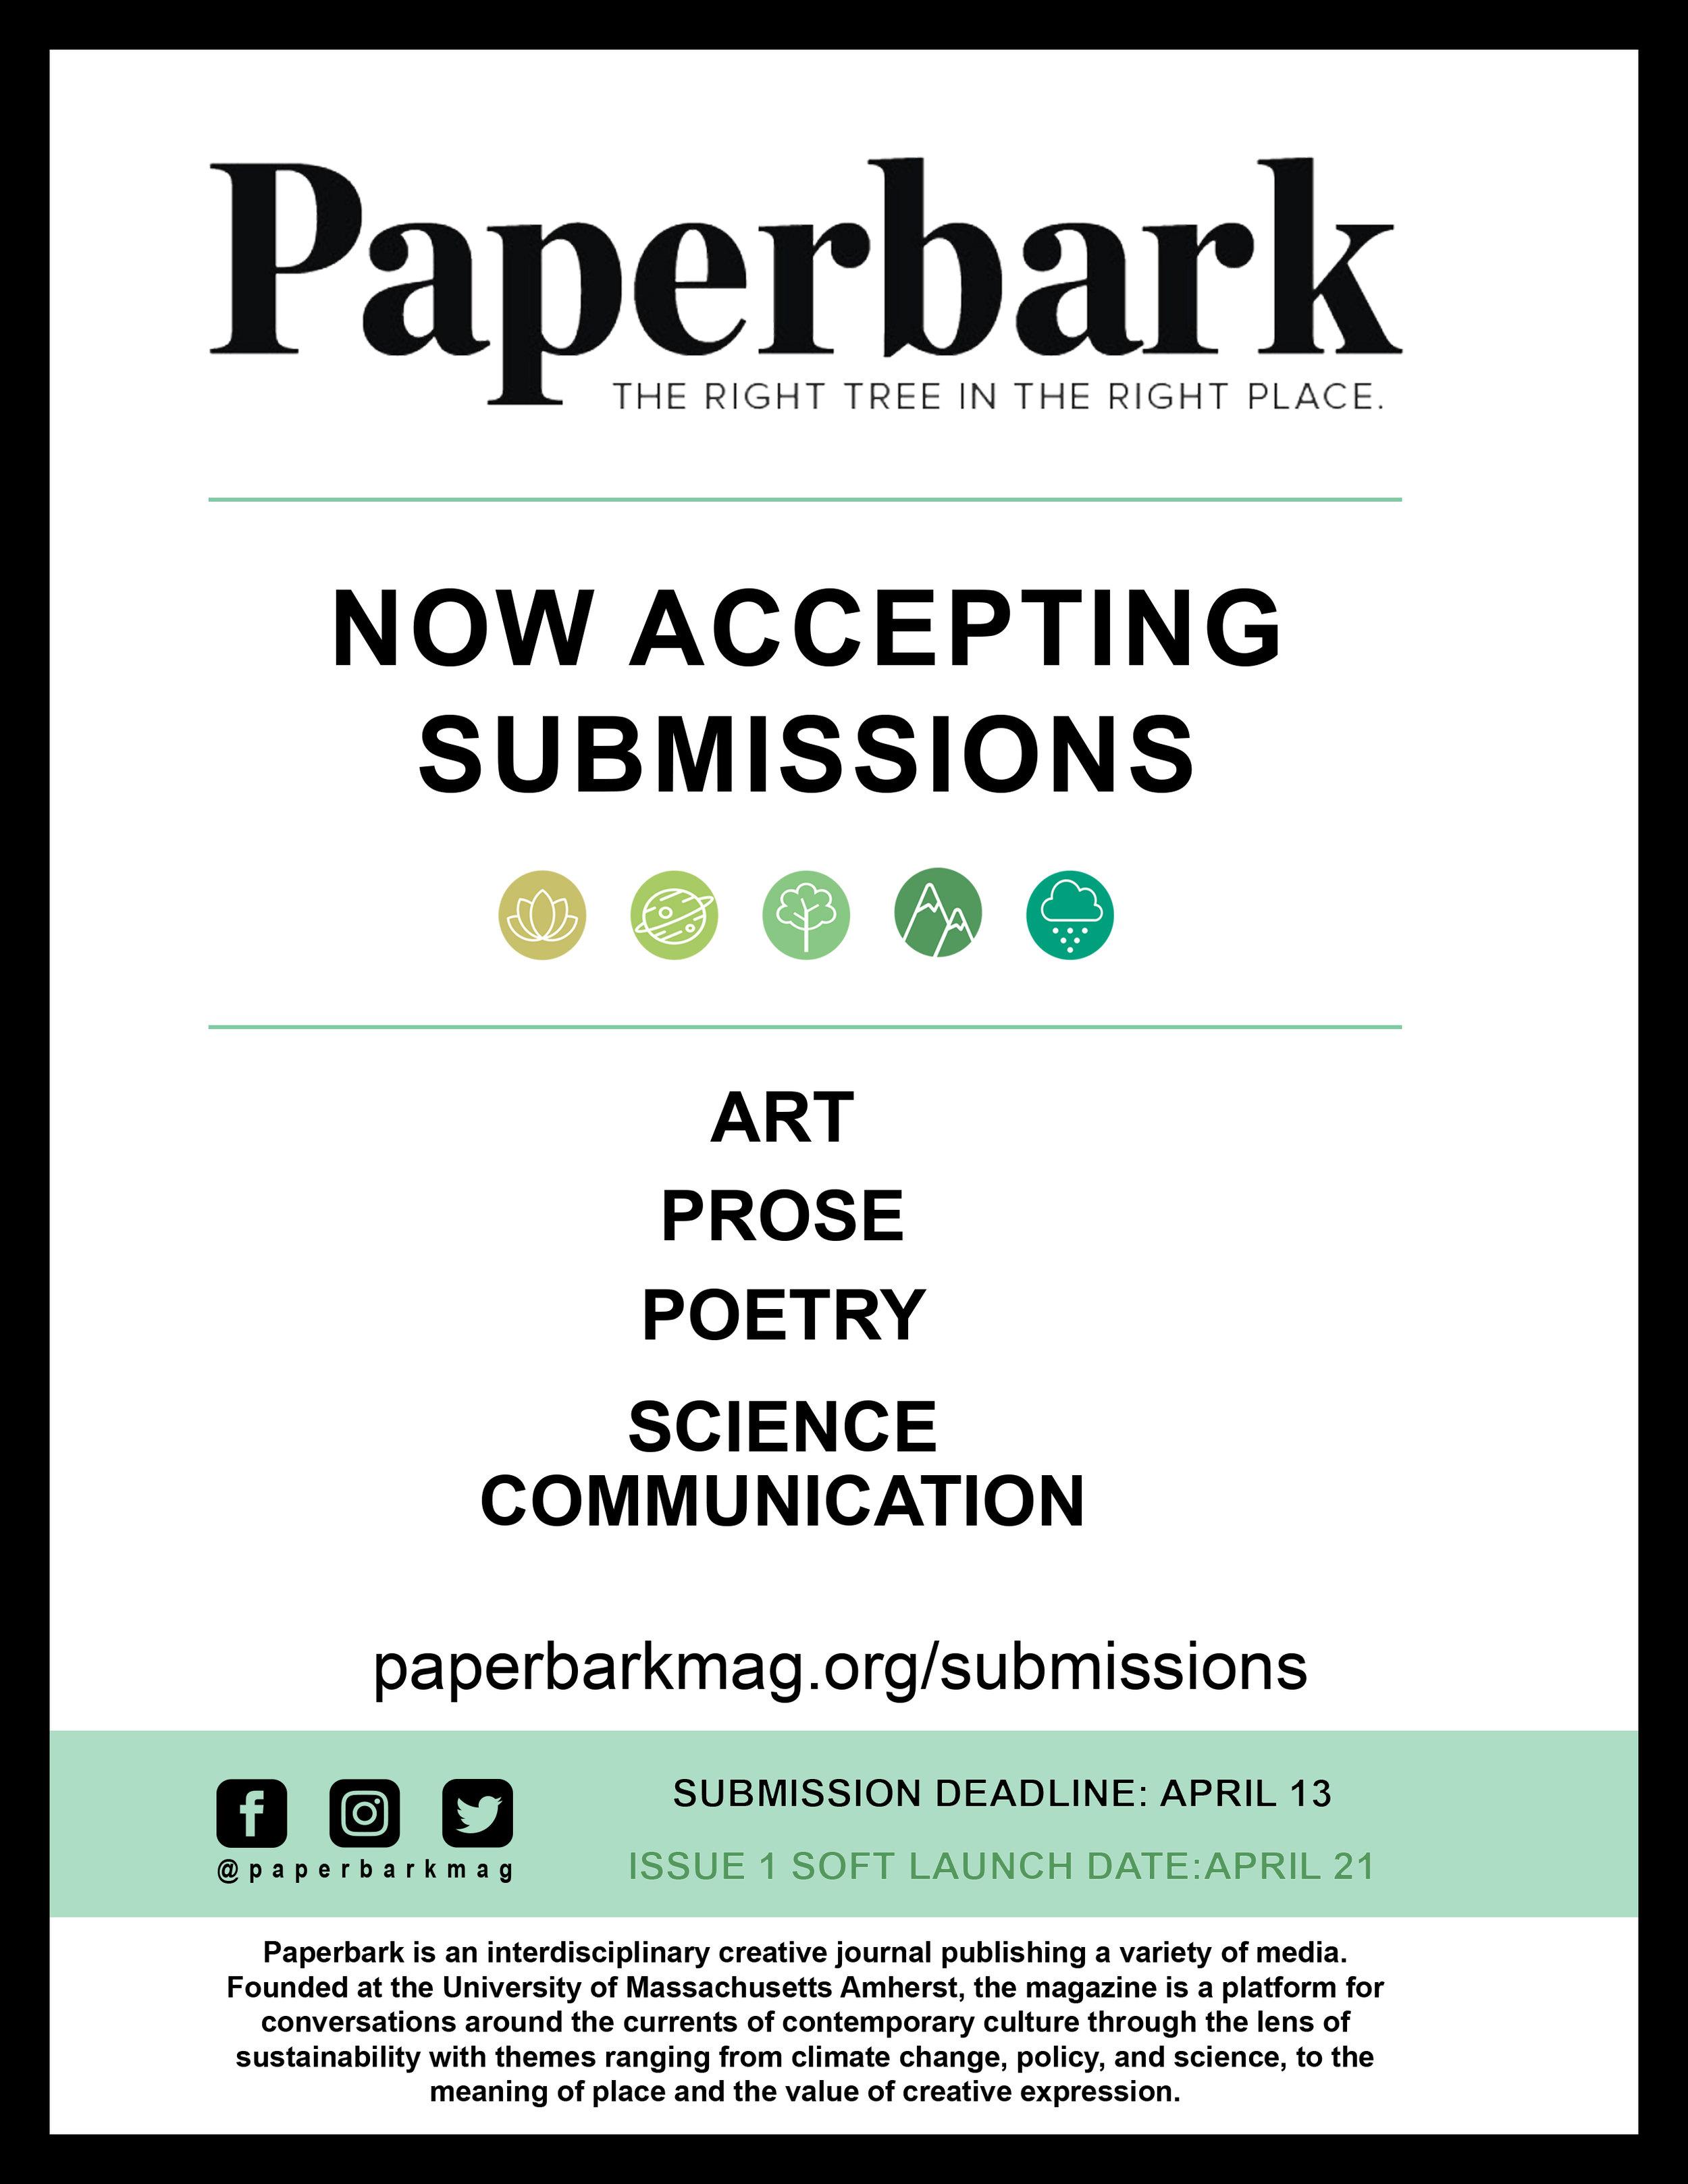 Paperbark_Submission_Poster.jpg